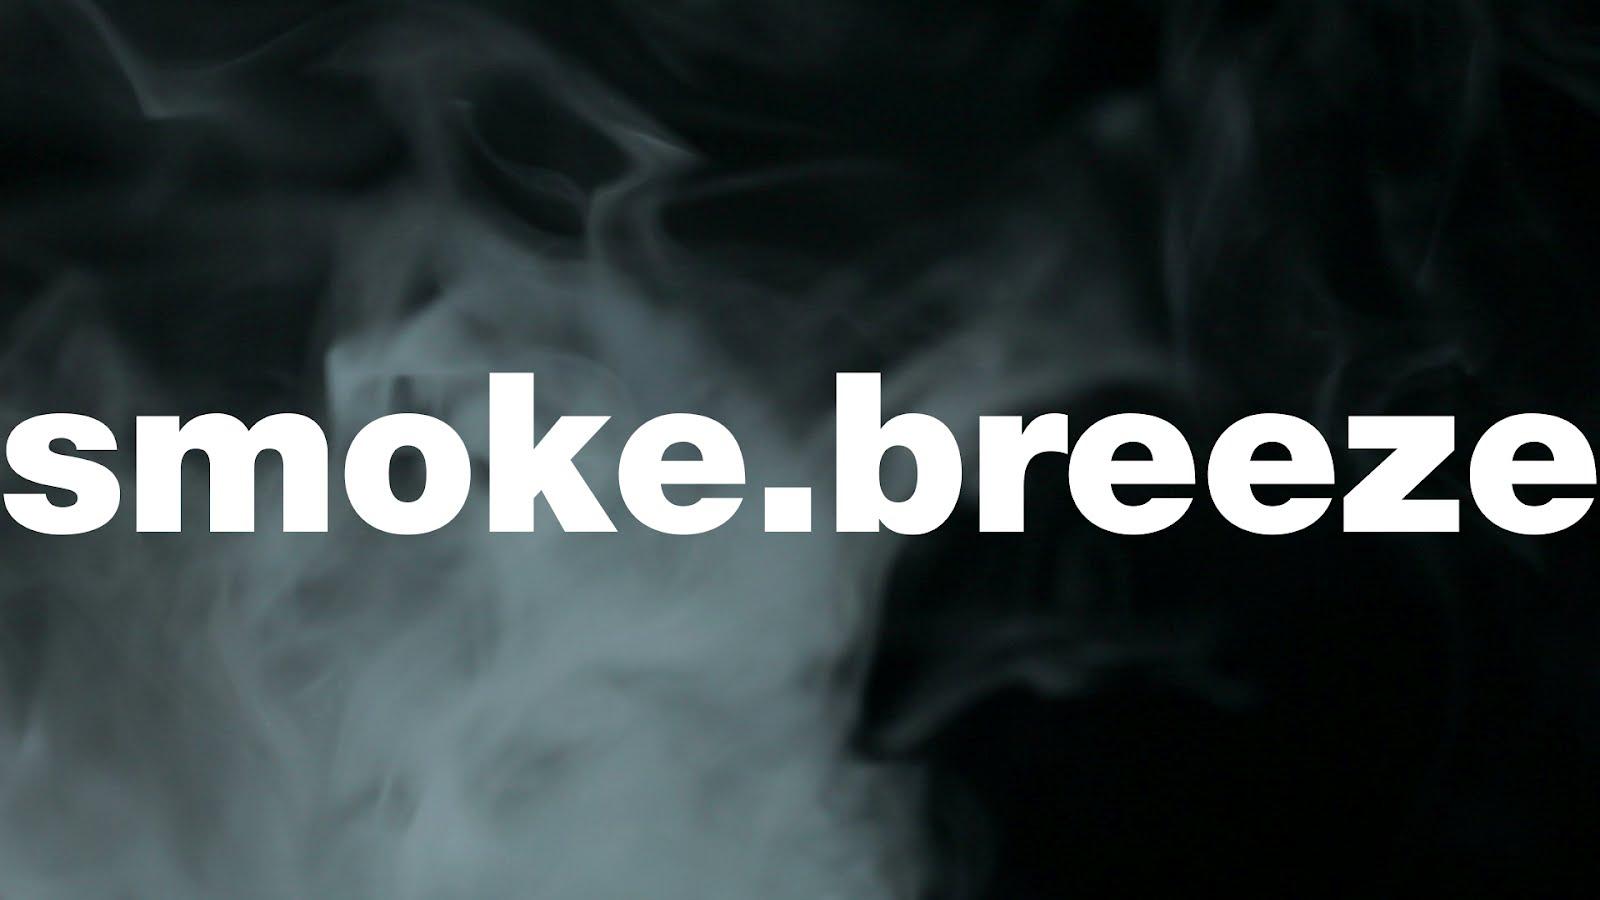 digital meals smoke breeze free stock footage digital meals